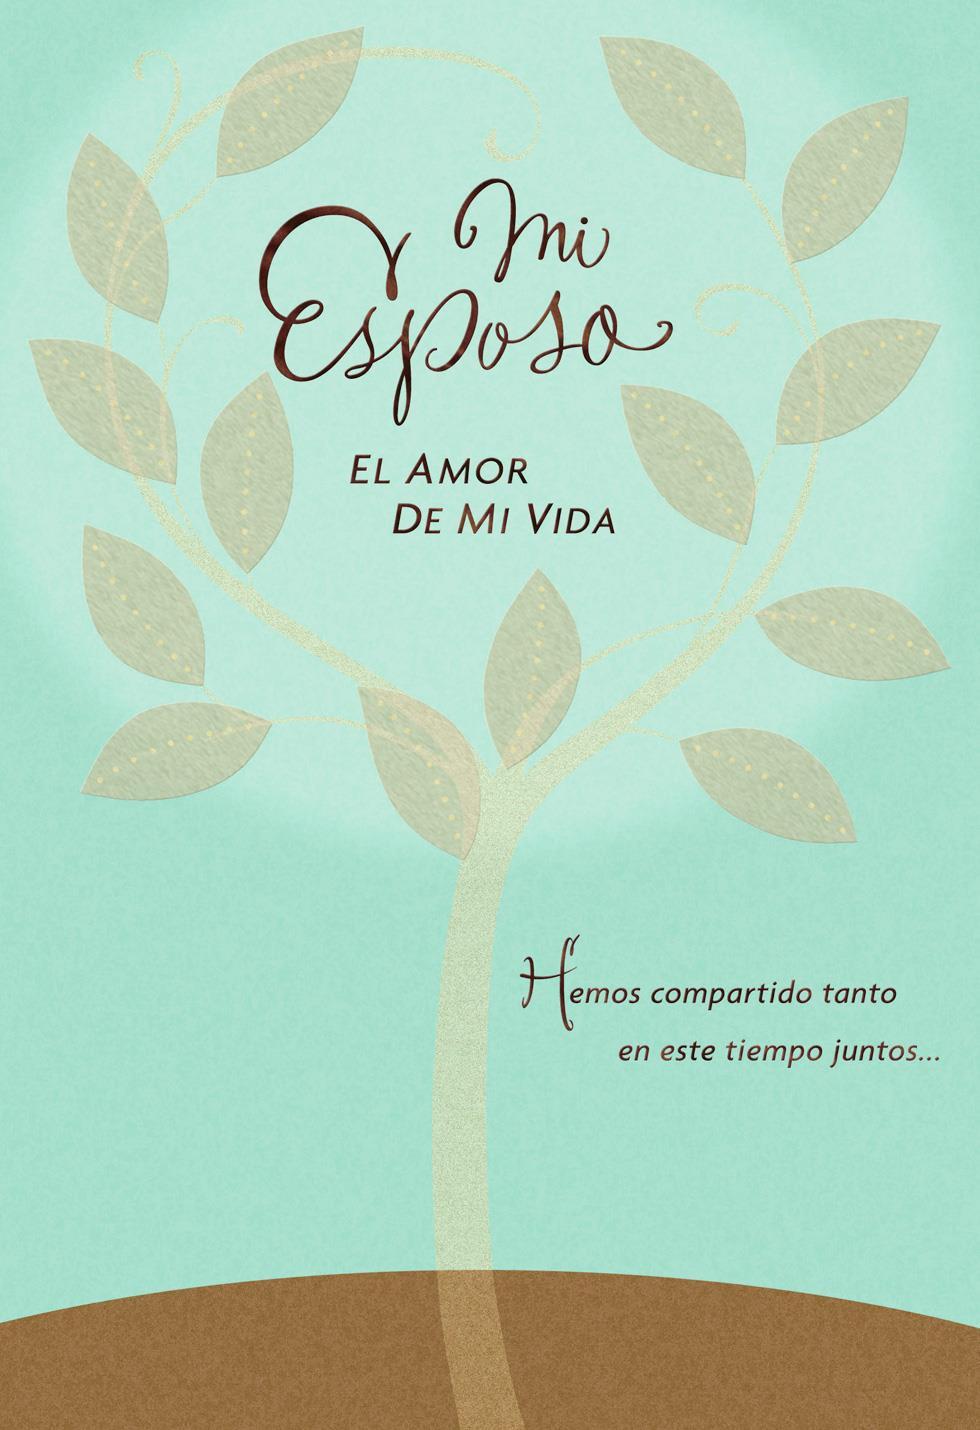 Youre the love of my life spanish language fathers day card for youre the love of my life spanish language fathers day card for husband m4hsunfo